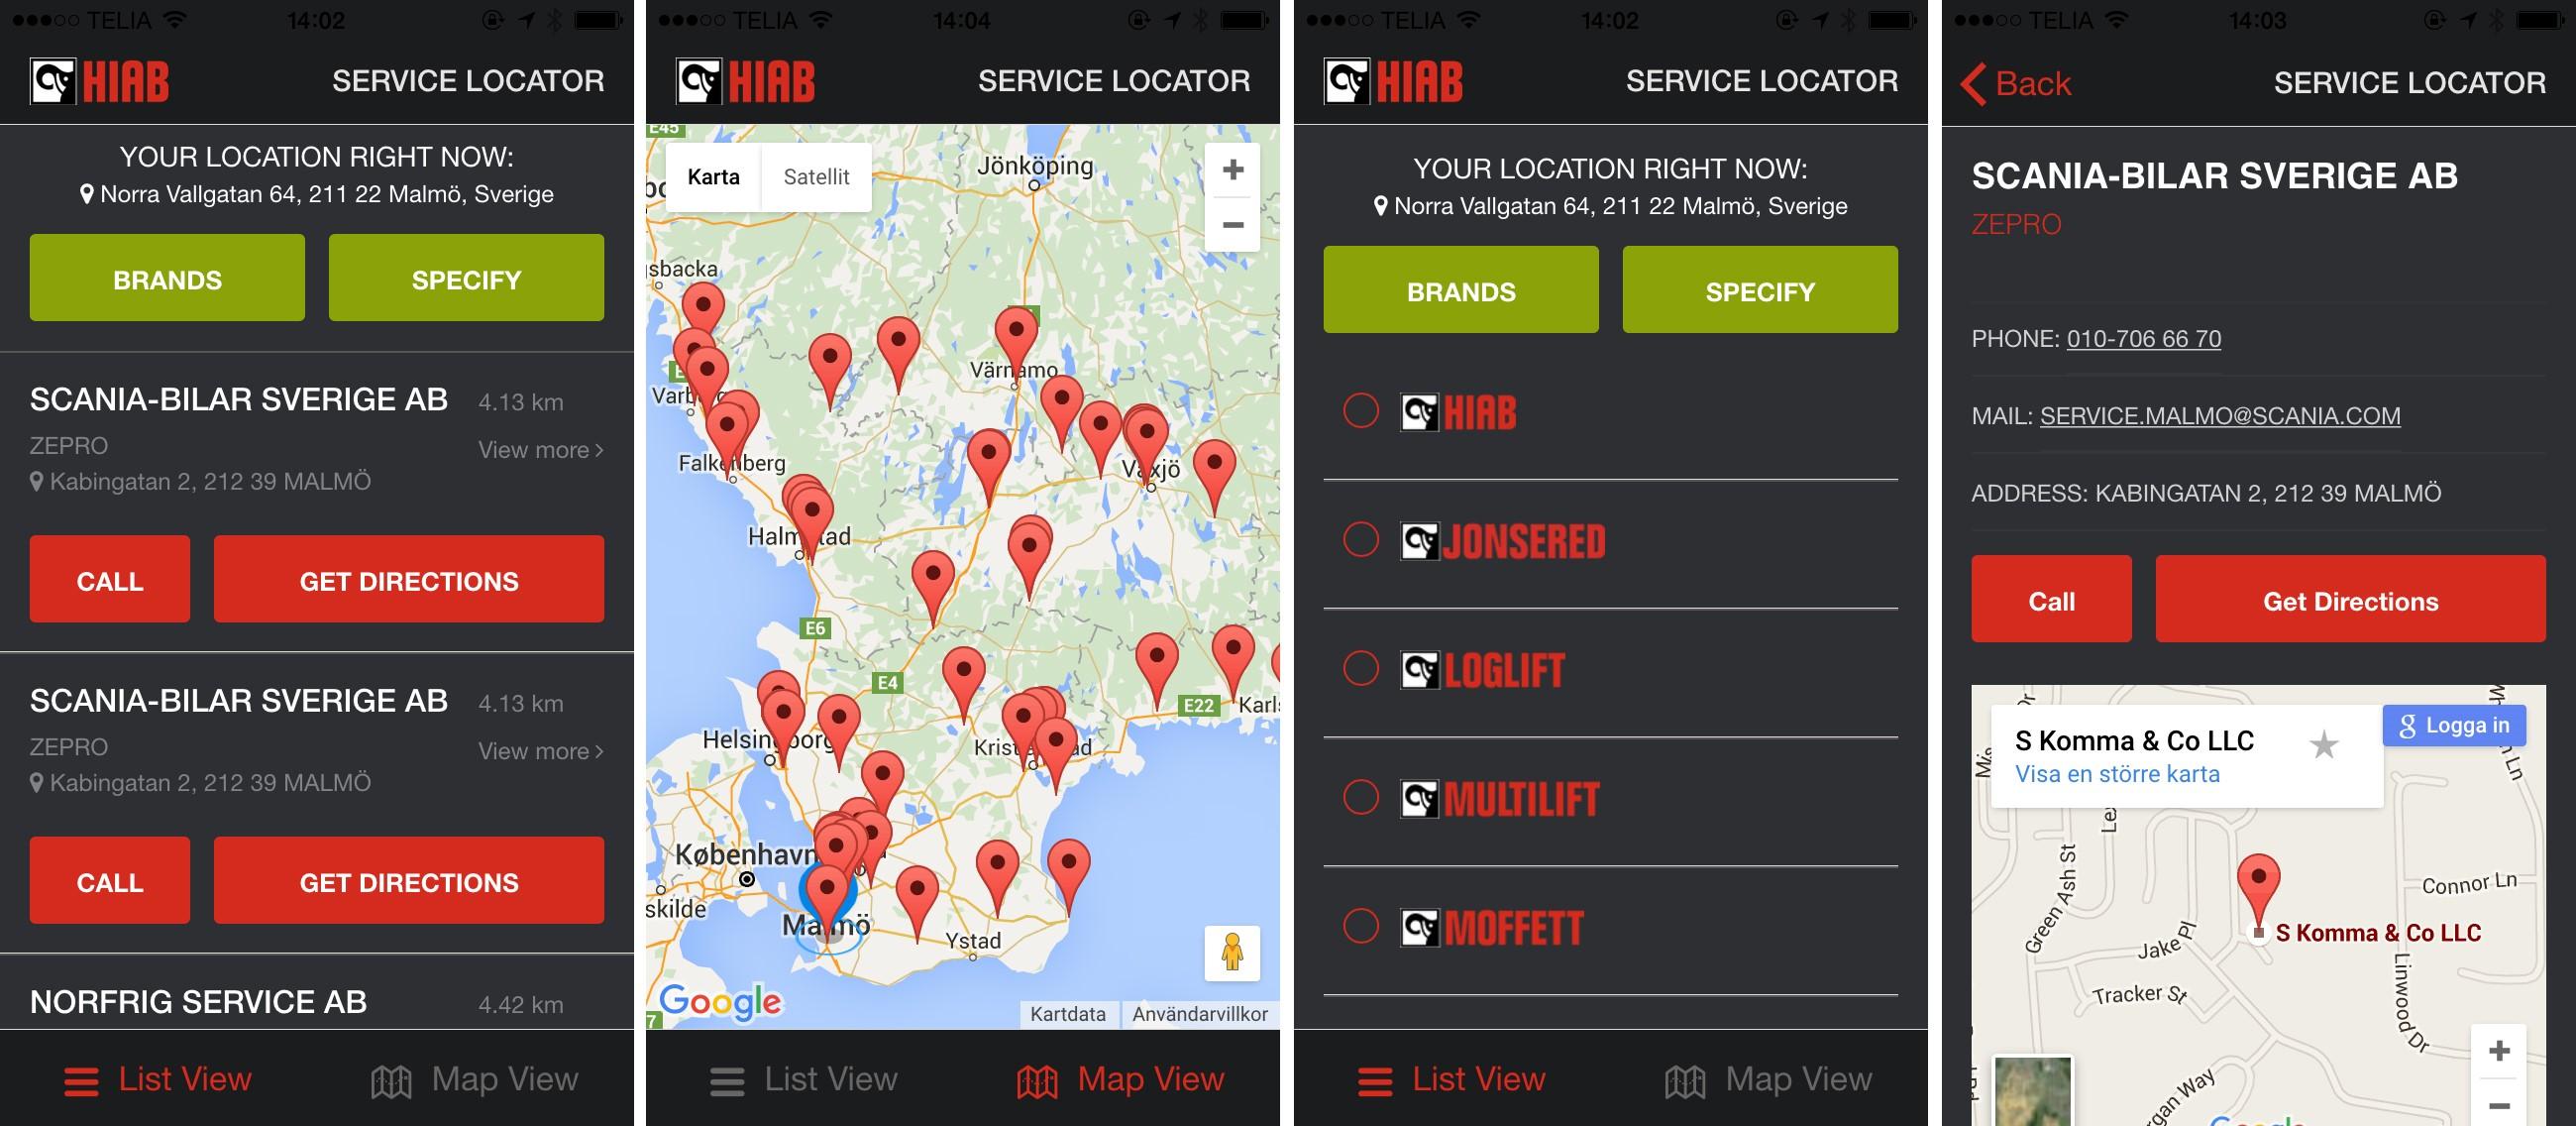 Hiab's Service Locator App